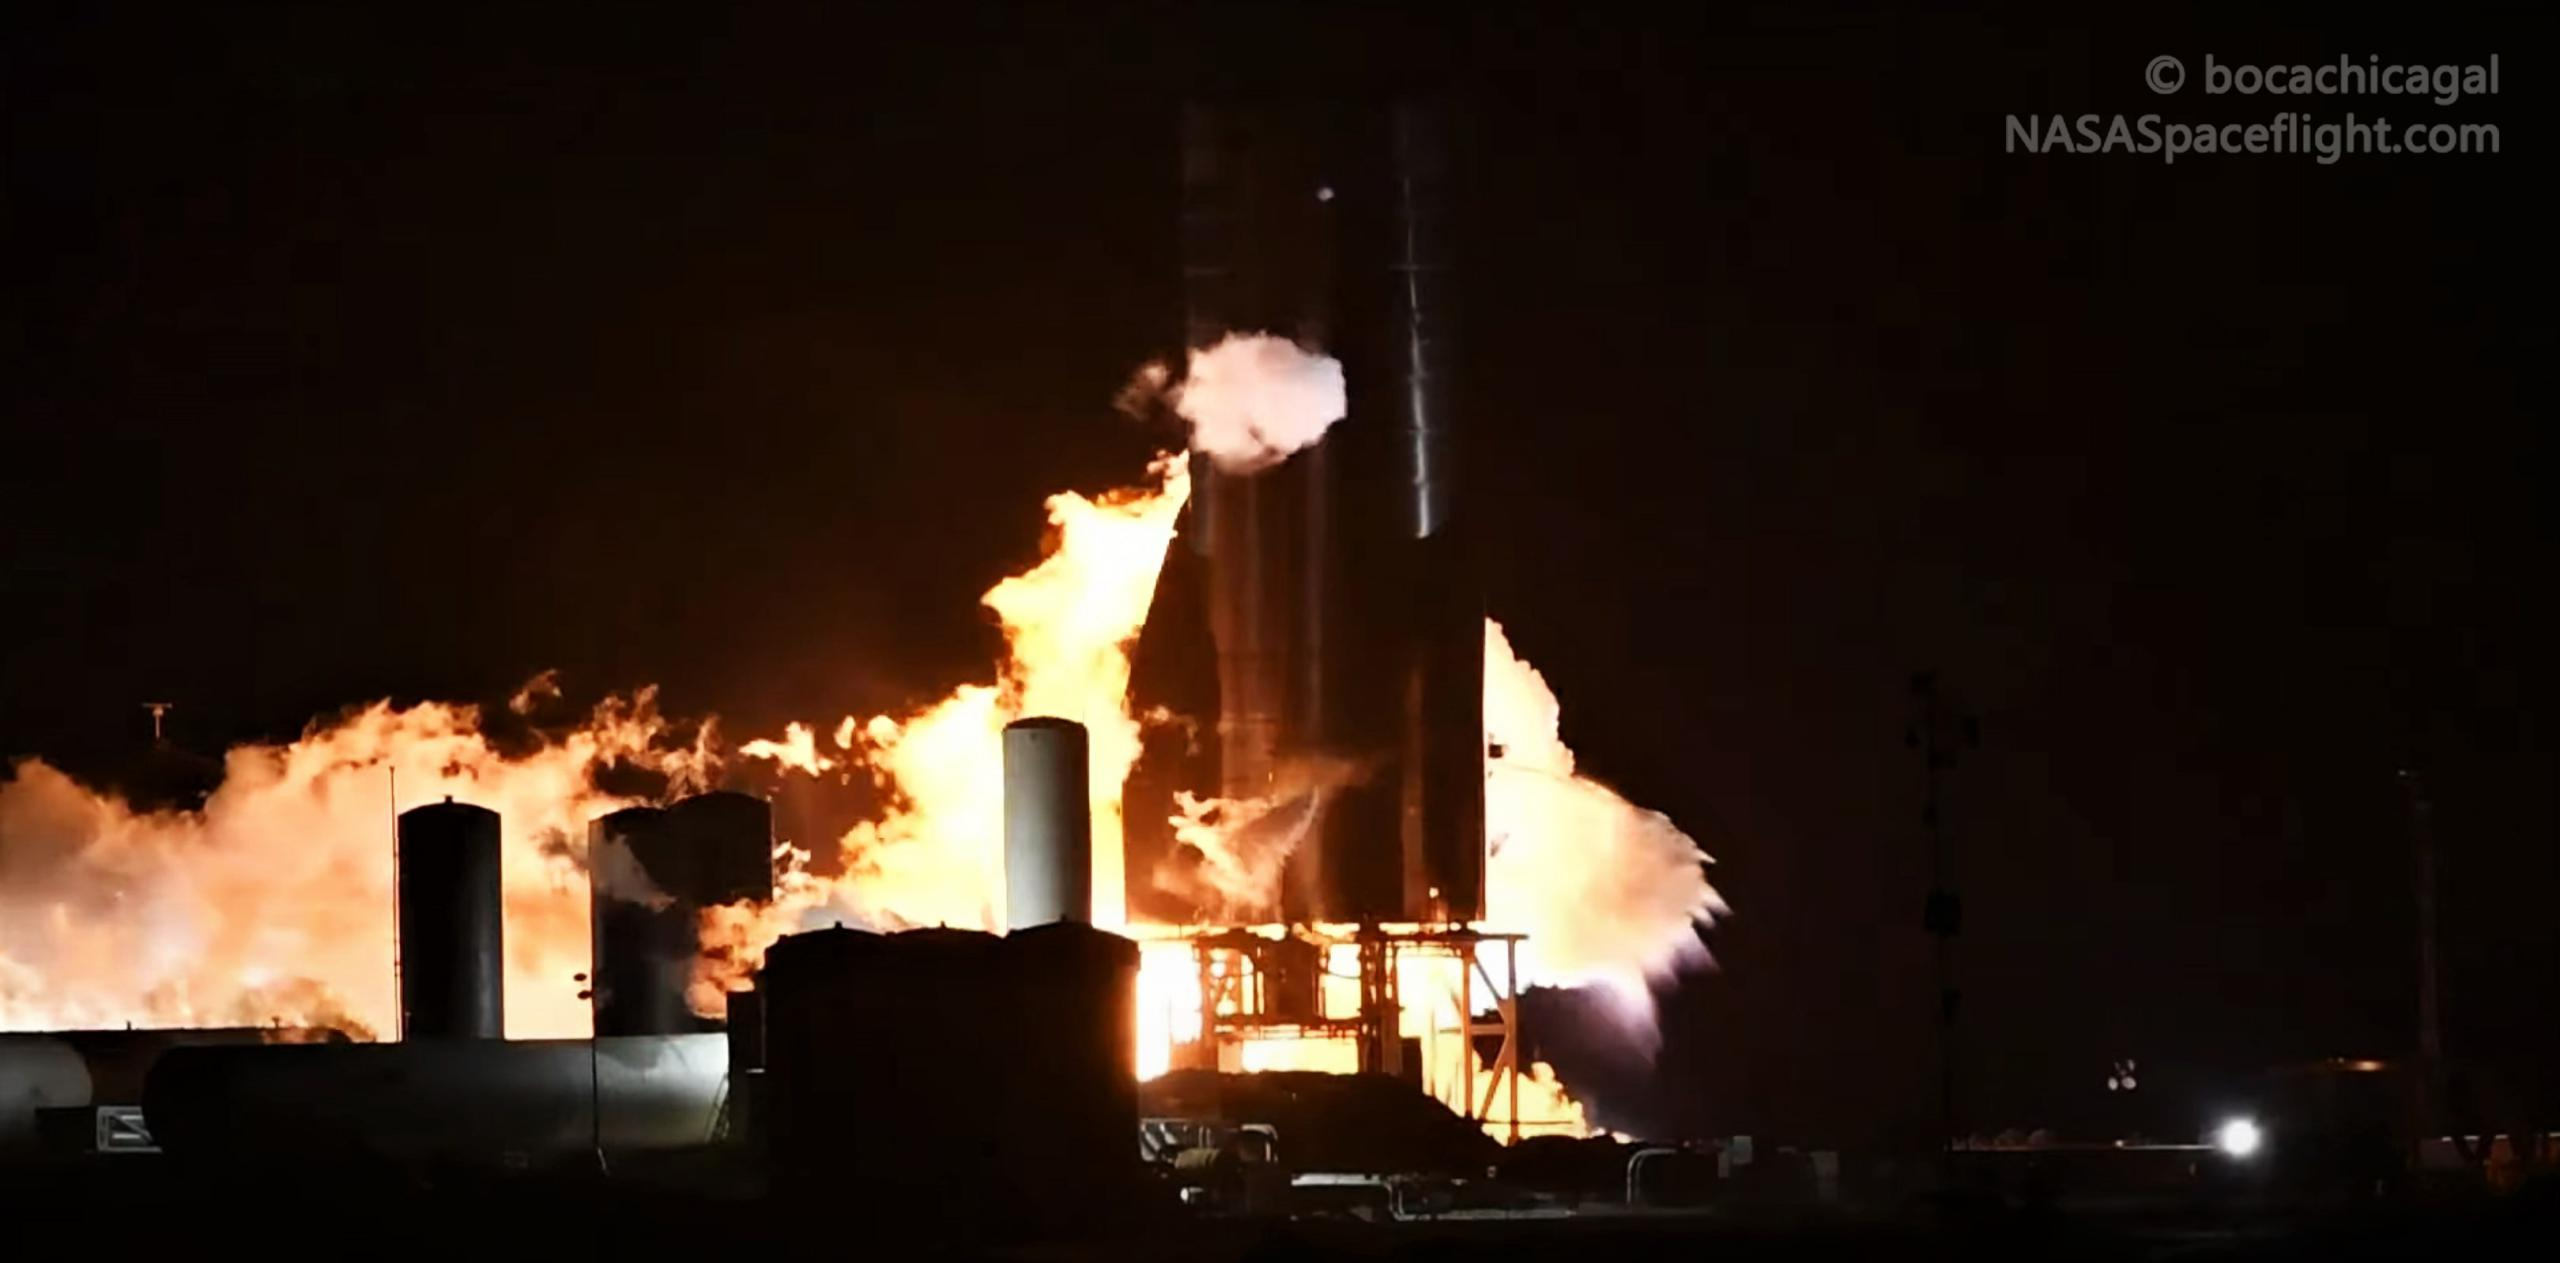 Starship Boca Chica 101920 (NASASpaceflight – bocachicagal) SN8 preburner test 1 (c)